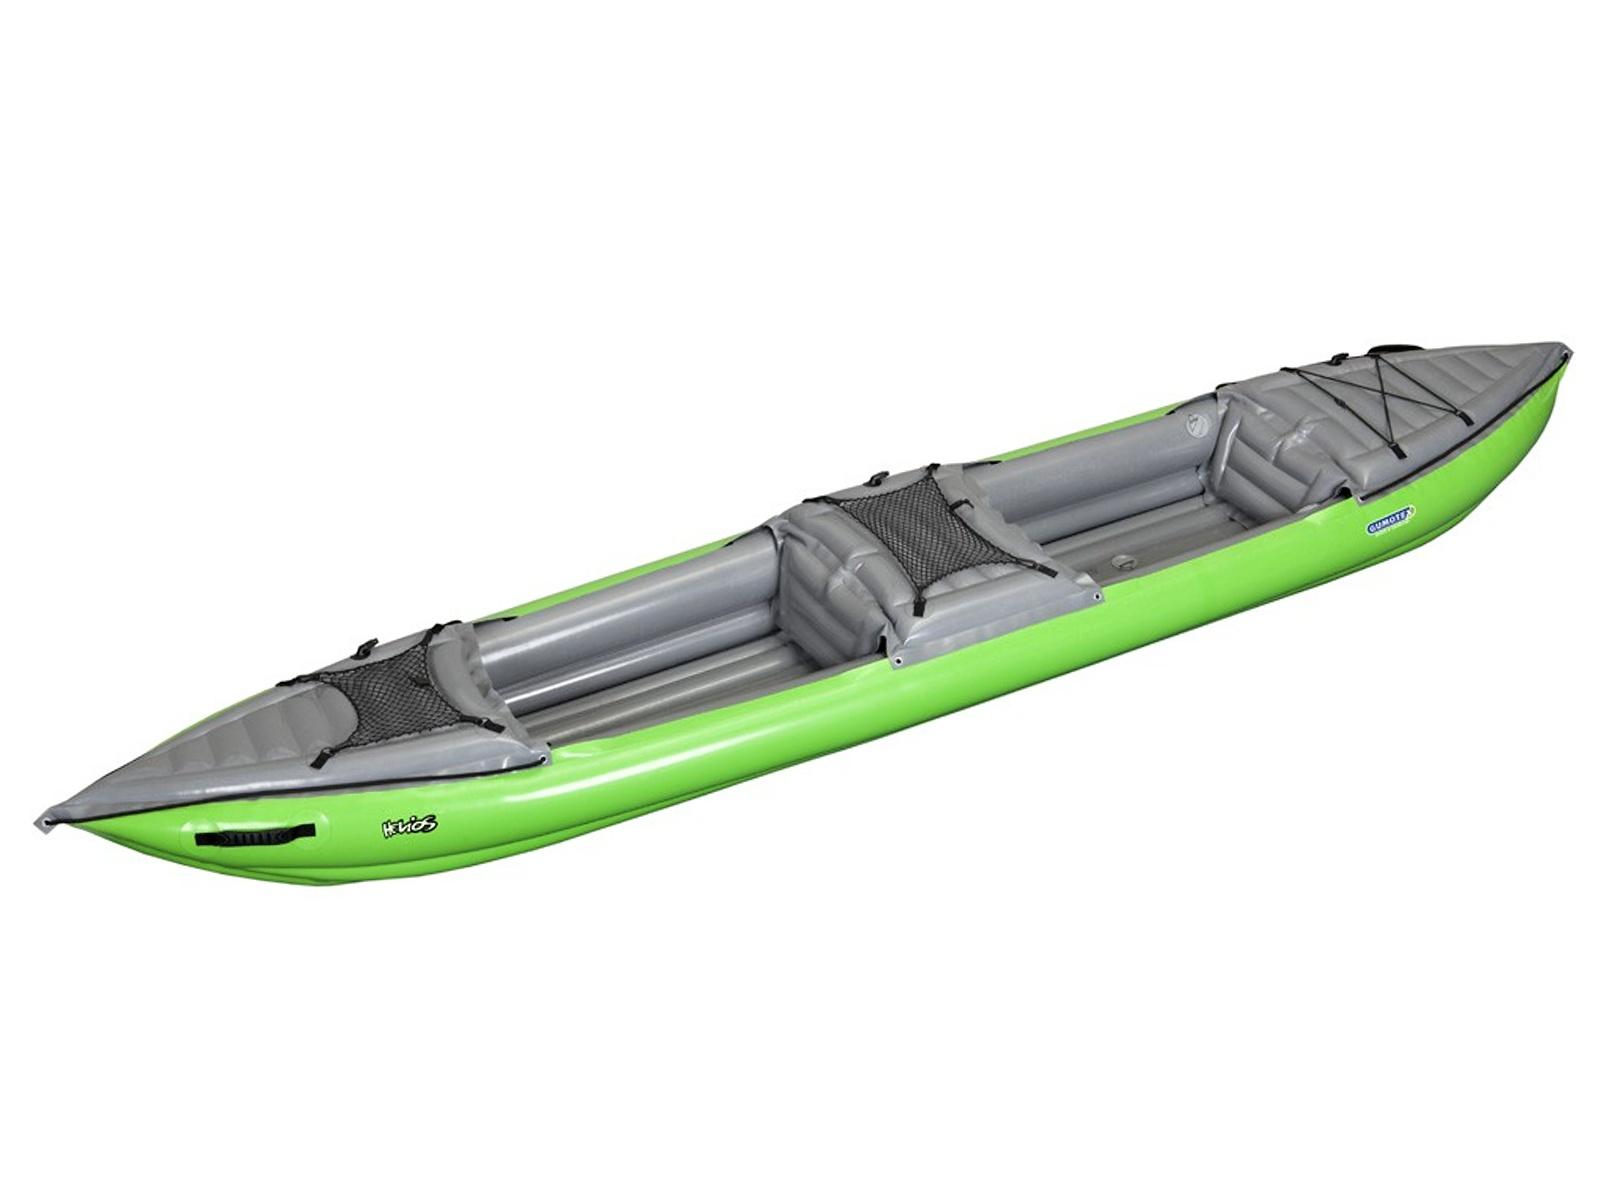 Nafukovací kajak GUMOTEX Helios II zeleno-šedý